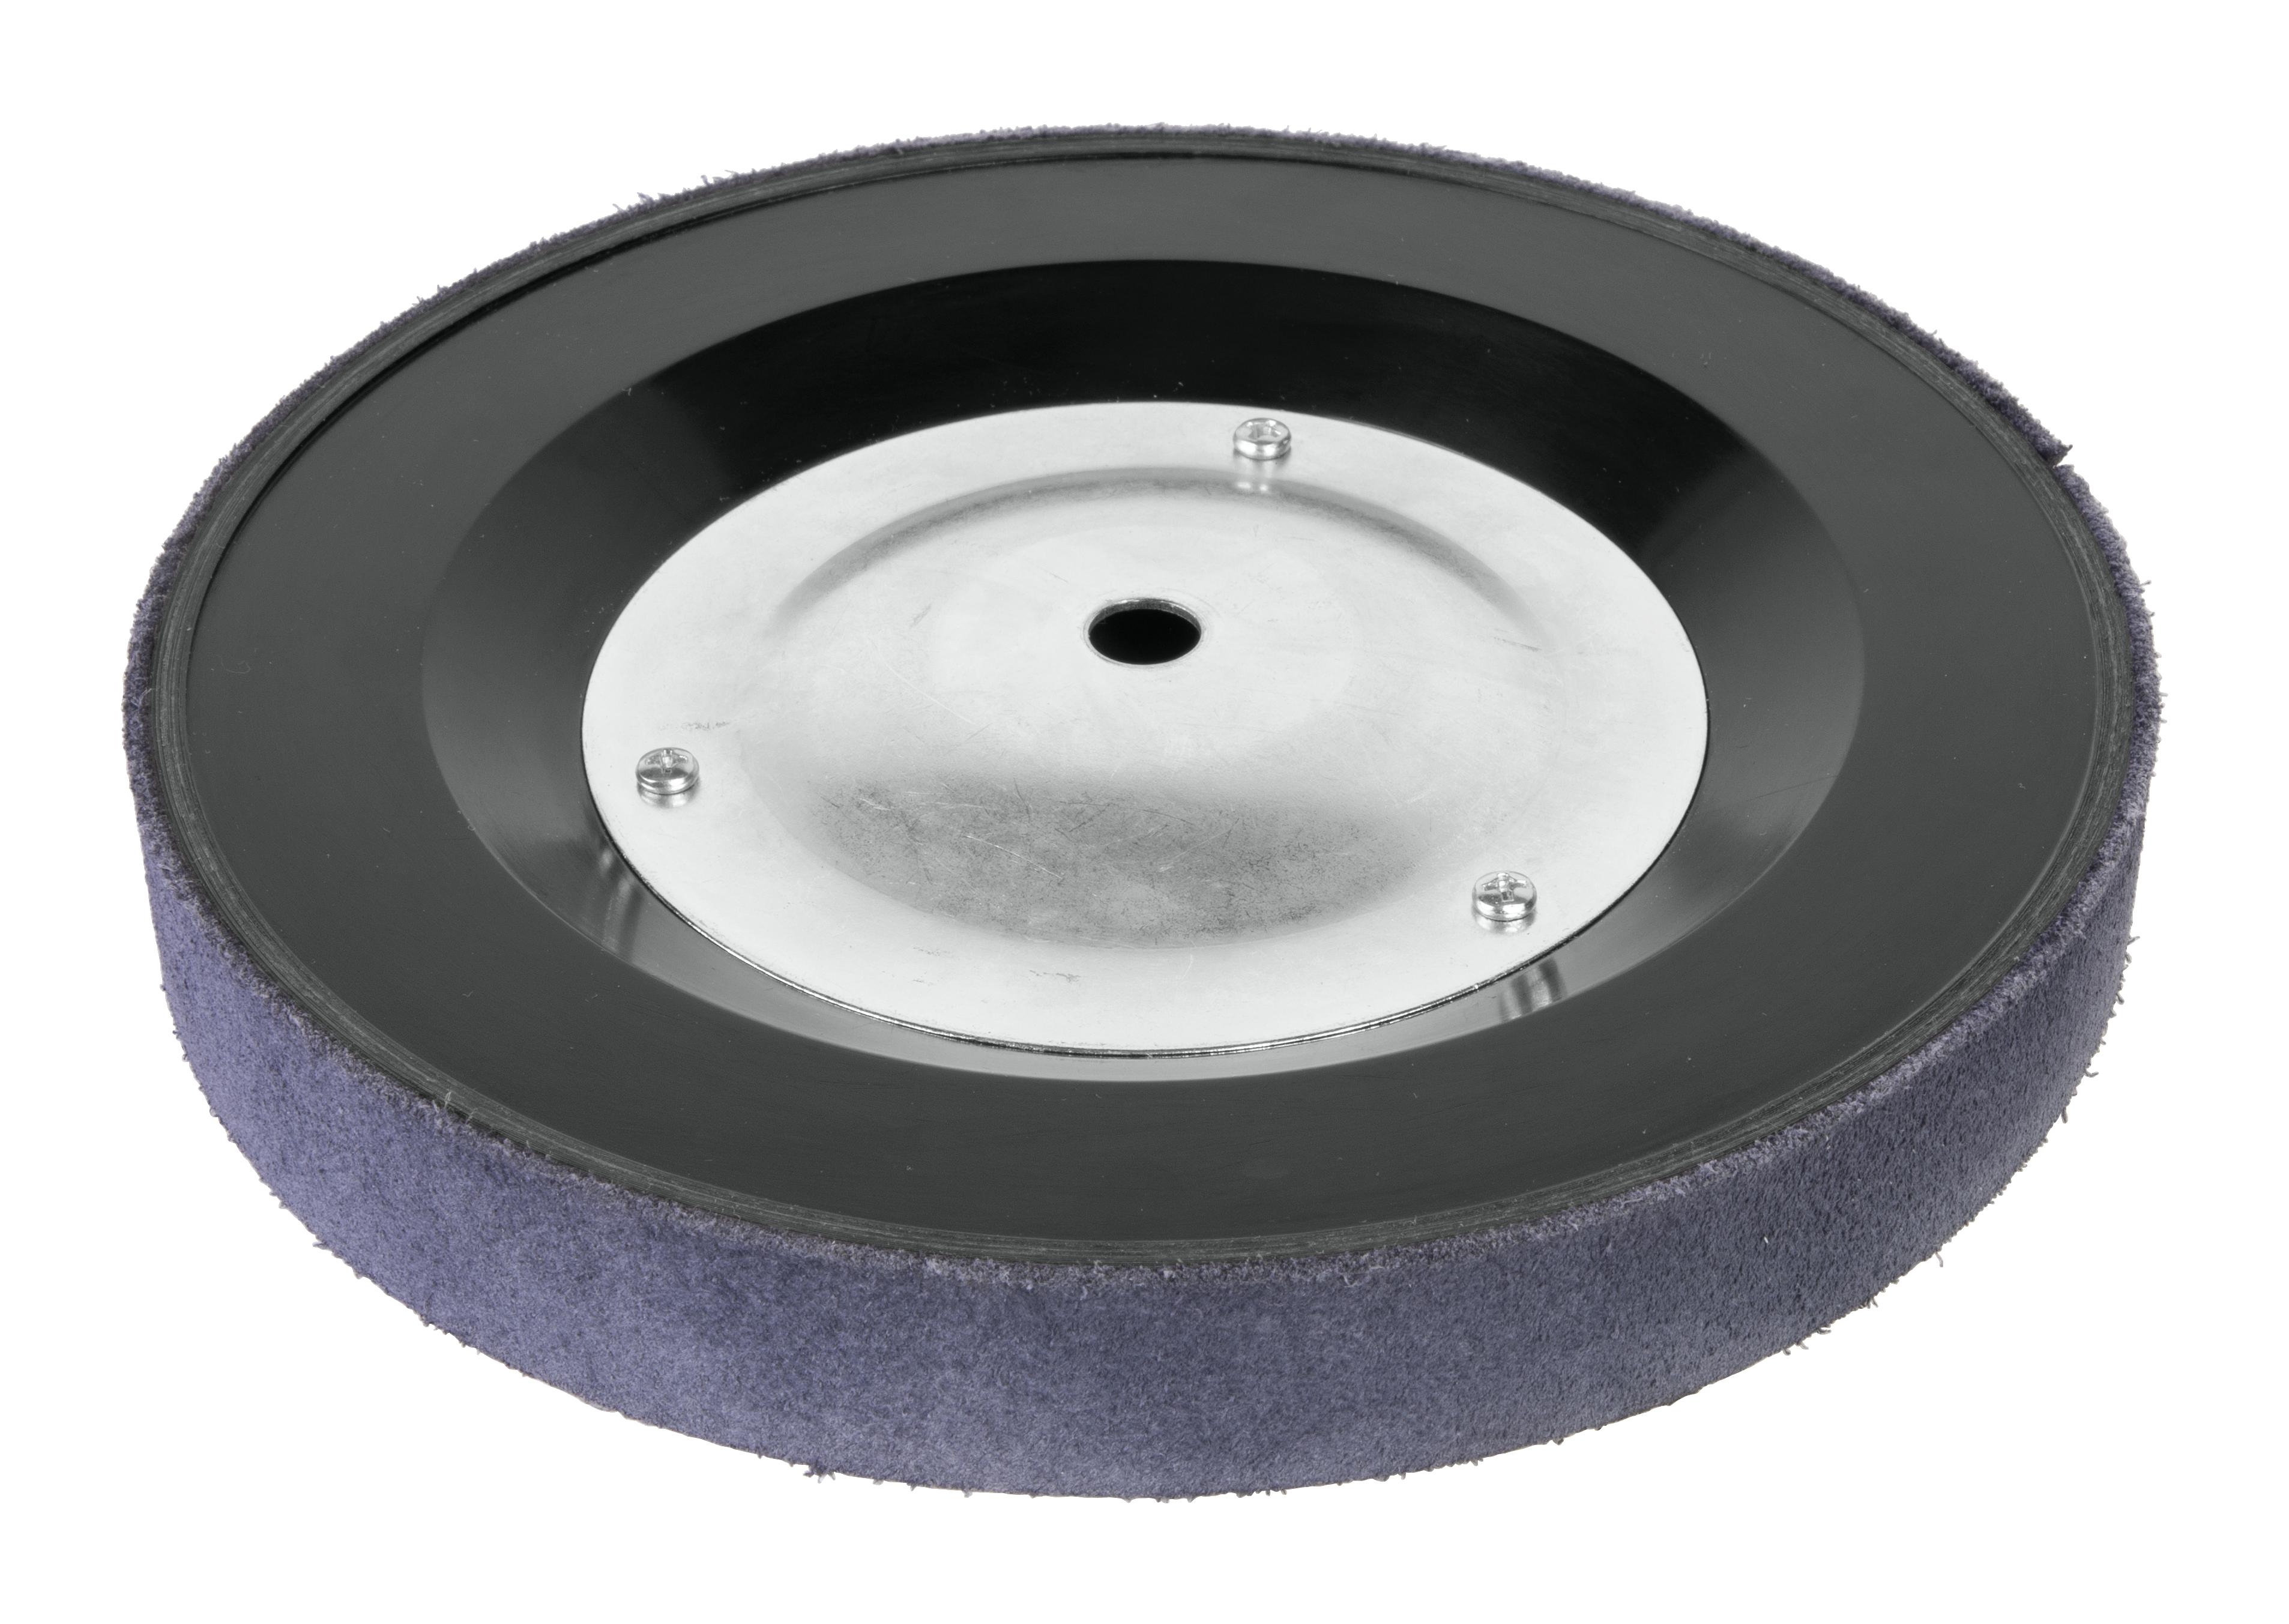 The Jet JWS-10 Leather Strop Wheel